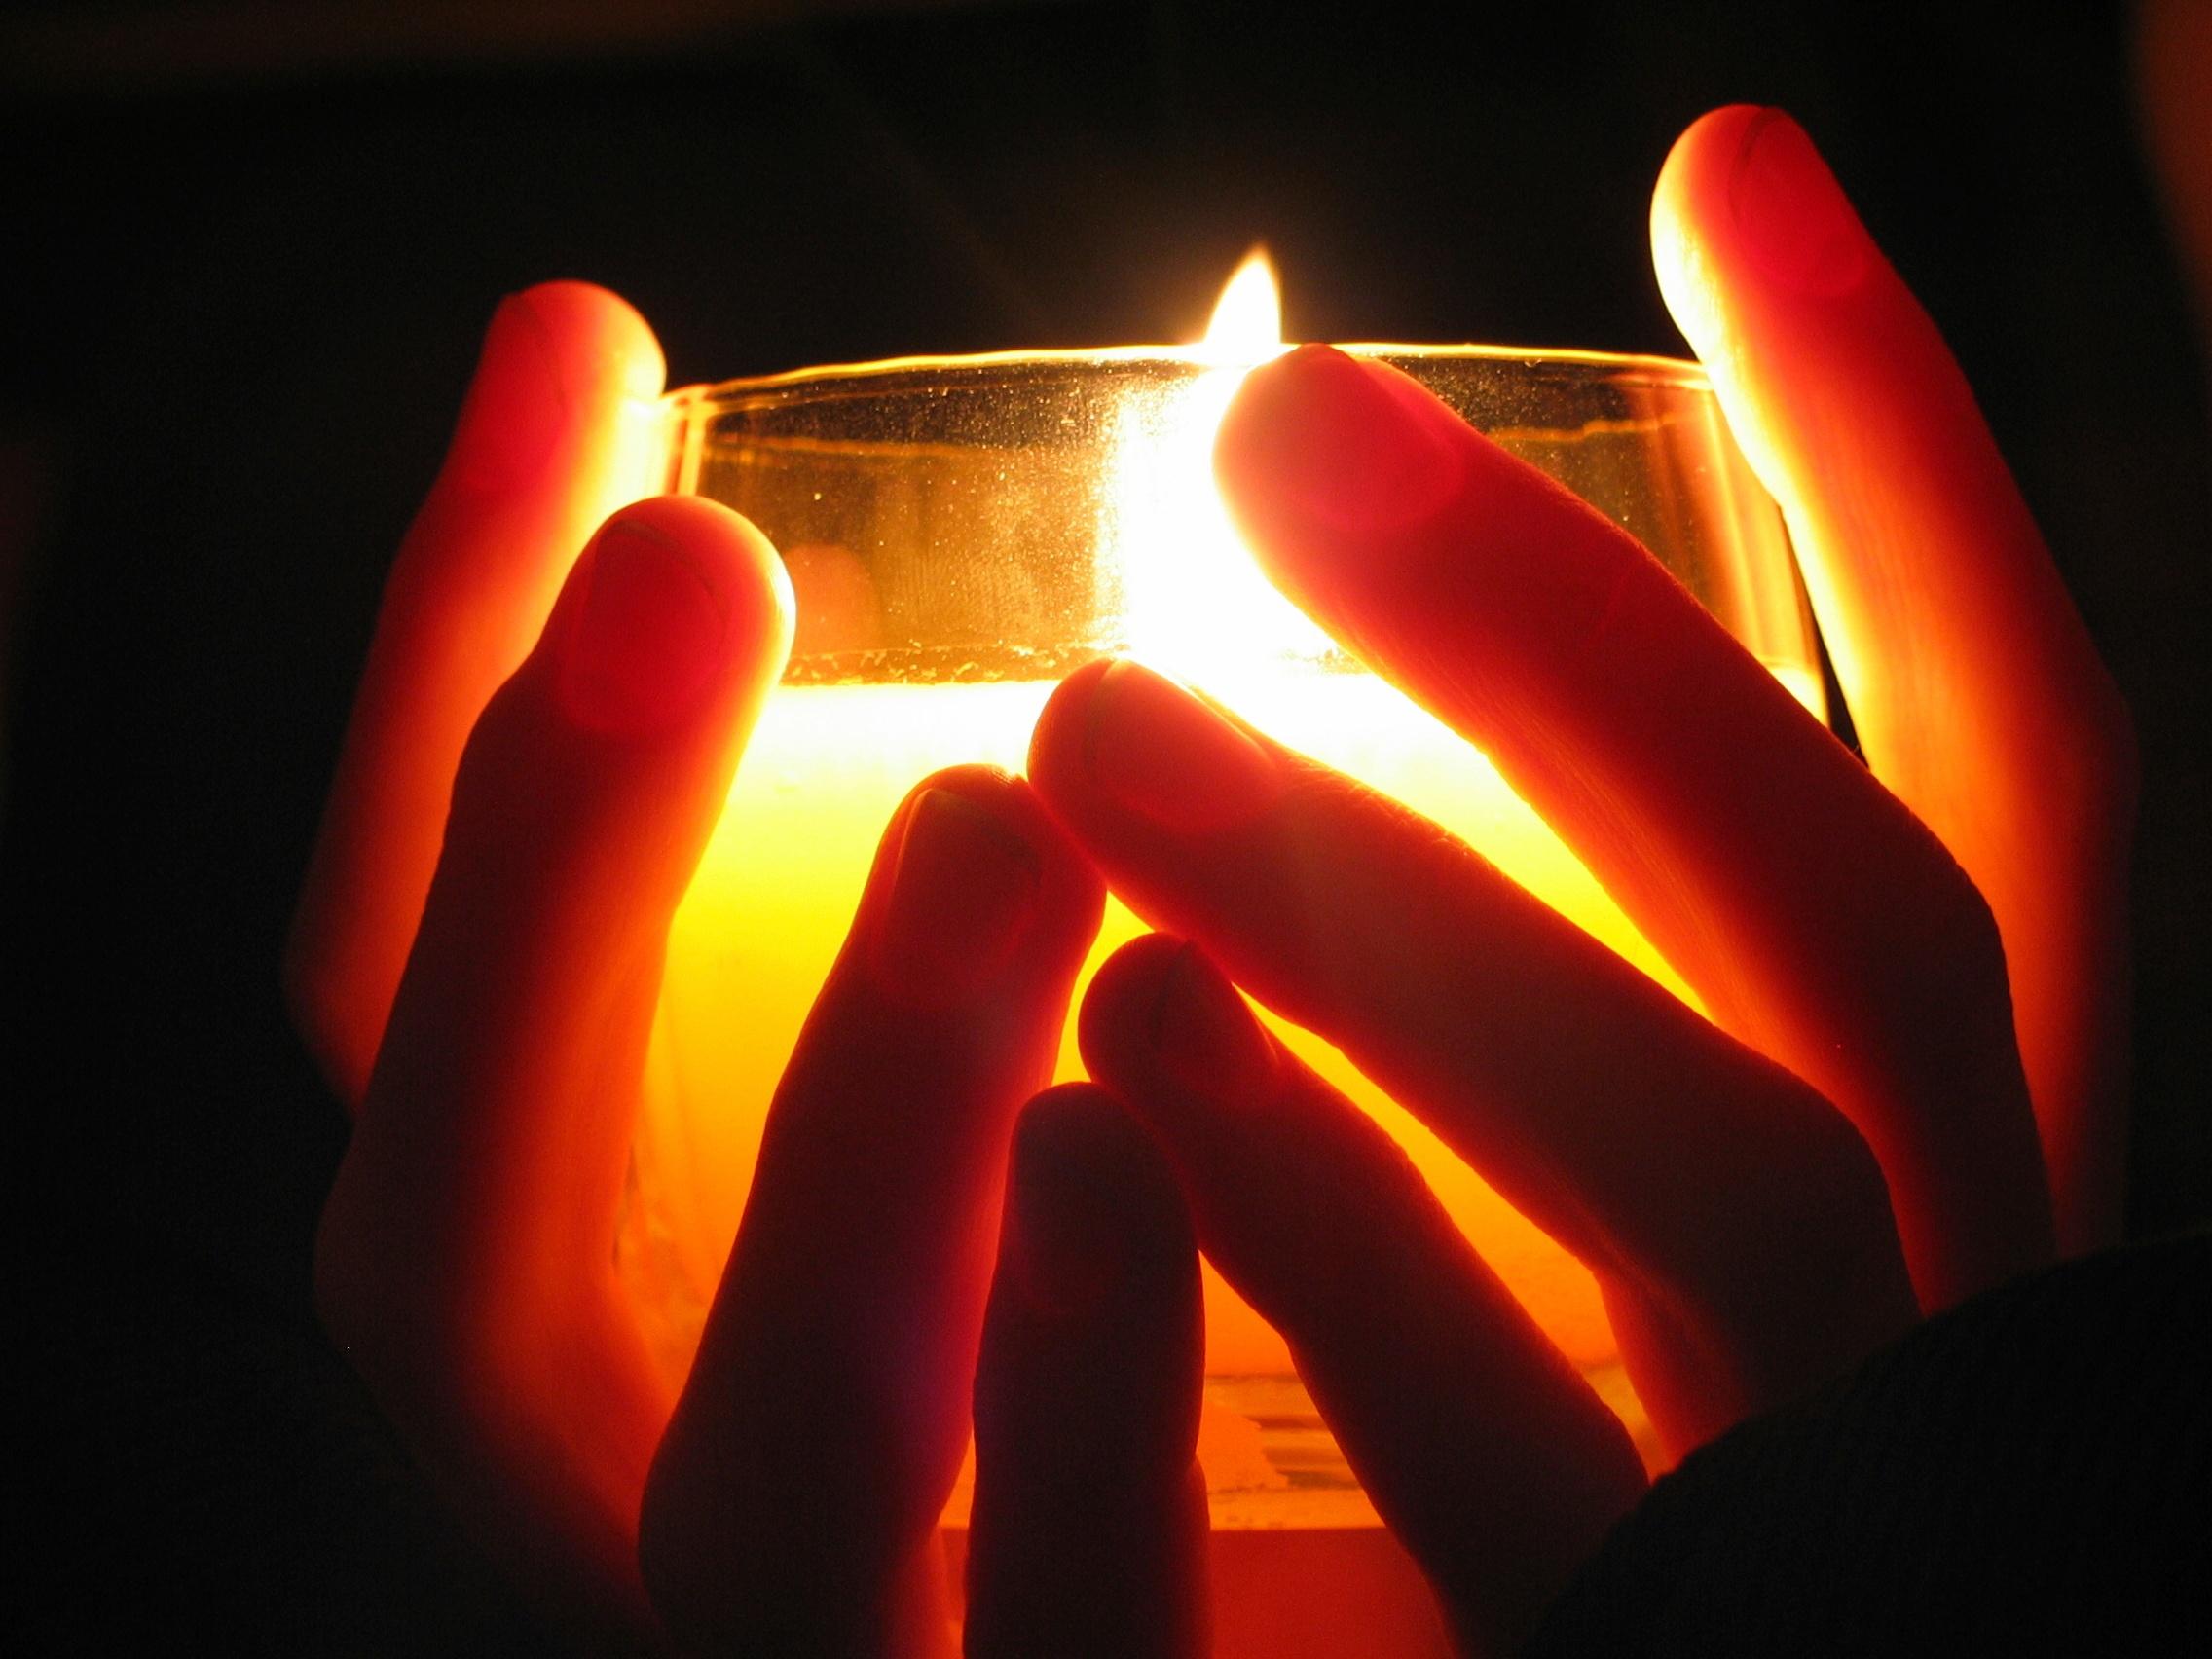 Candle_Hands_iStock_000000153399_Medium.jpg